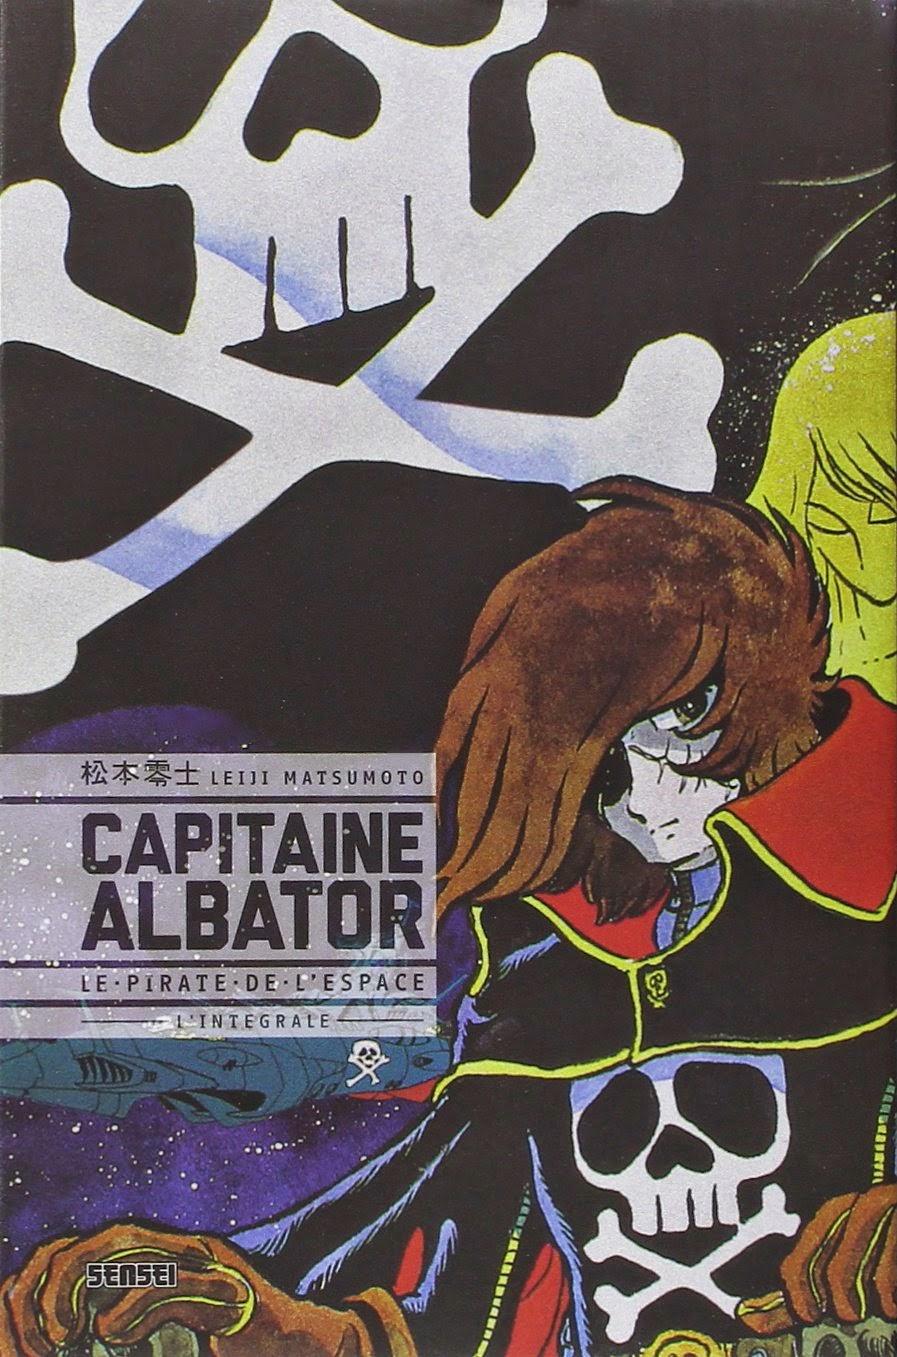 Matsumoto, Leiji - Capitaine Albator Intégrale